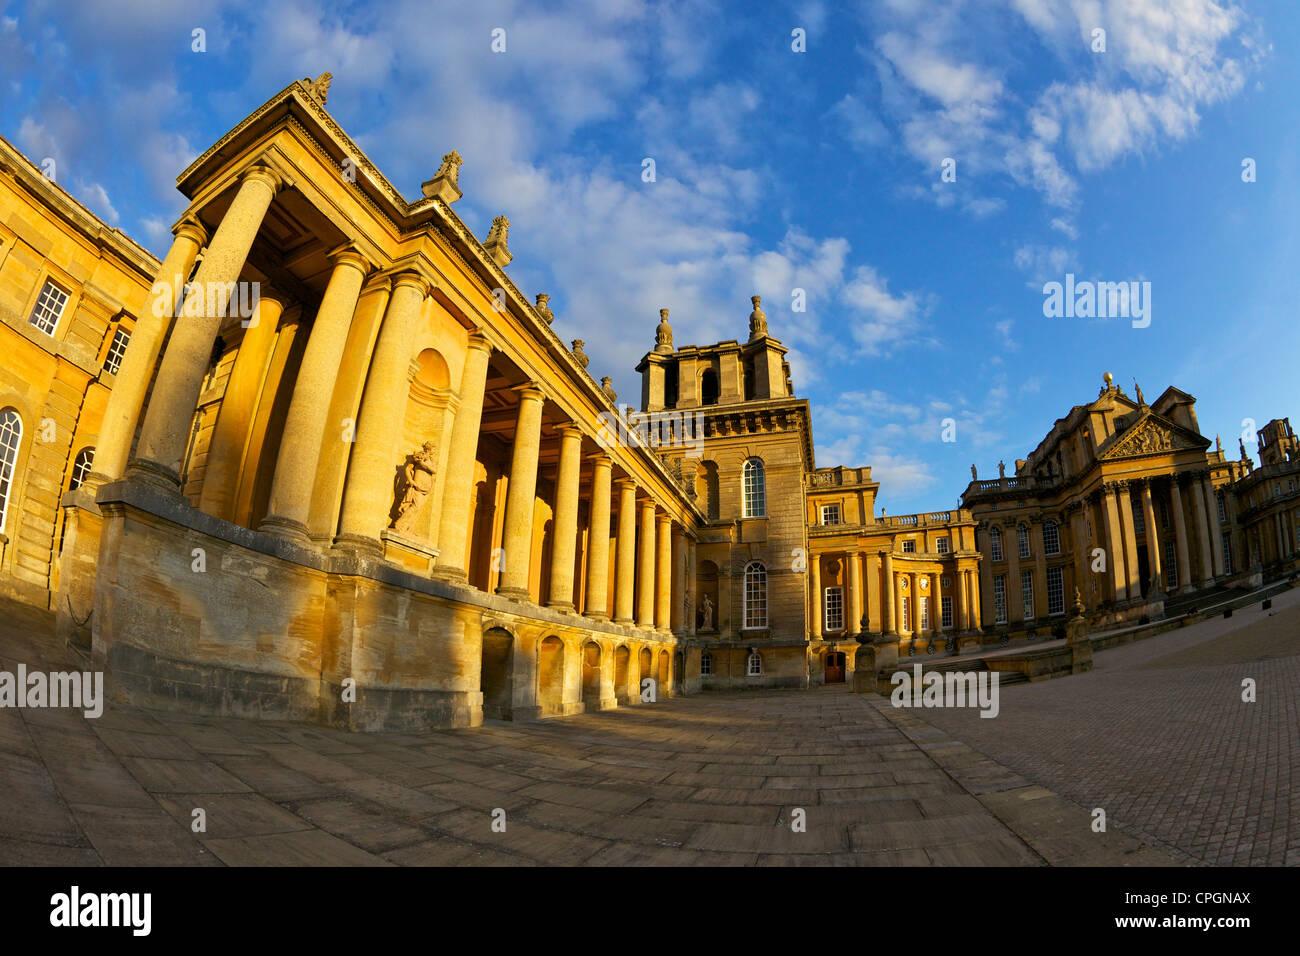 Gran Corte de Blenheim Palace, lugar de nacimiento de Sir Winston Churchill, Woodstock, Oxfordshire, Inglaterra, Imagen De Stock